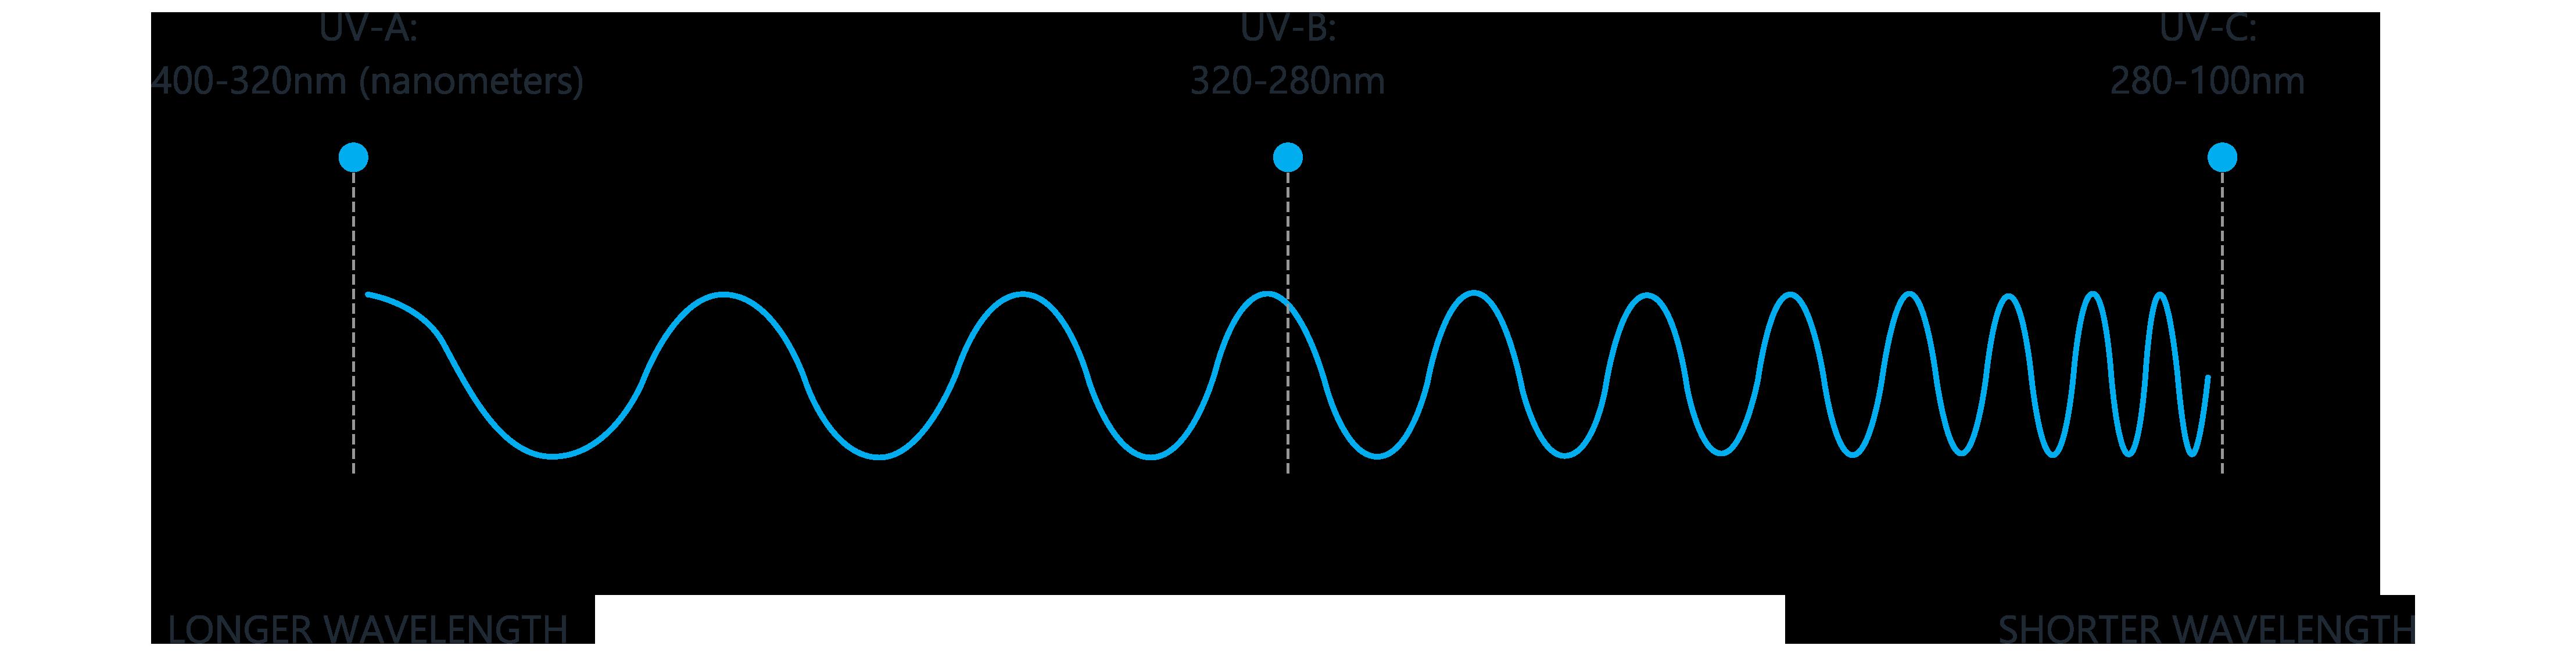 wavelength-graph